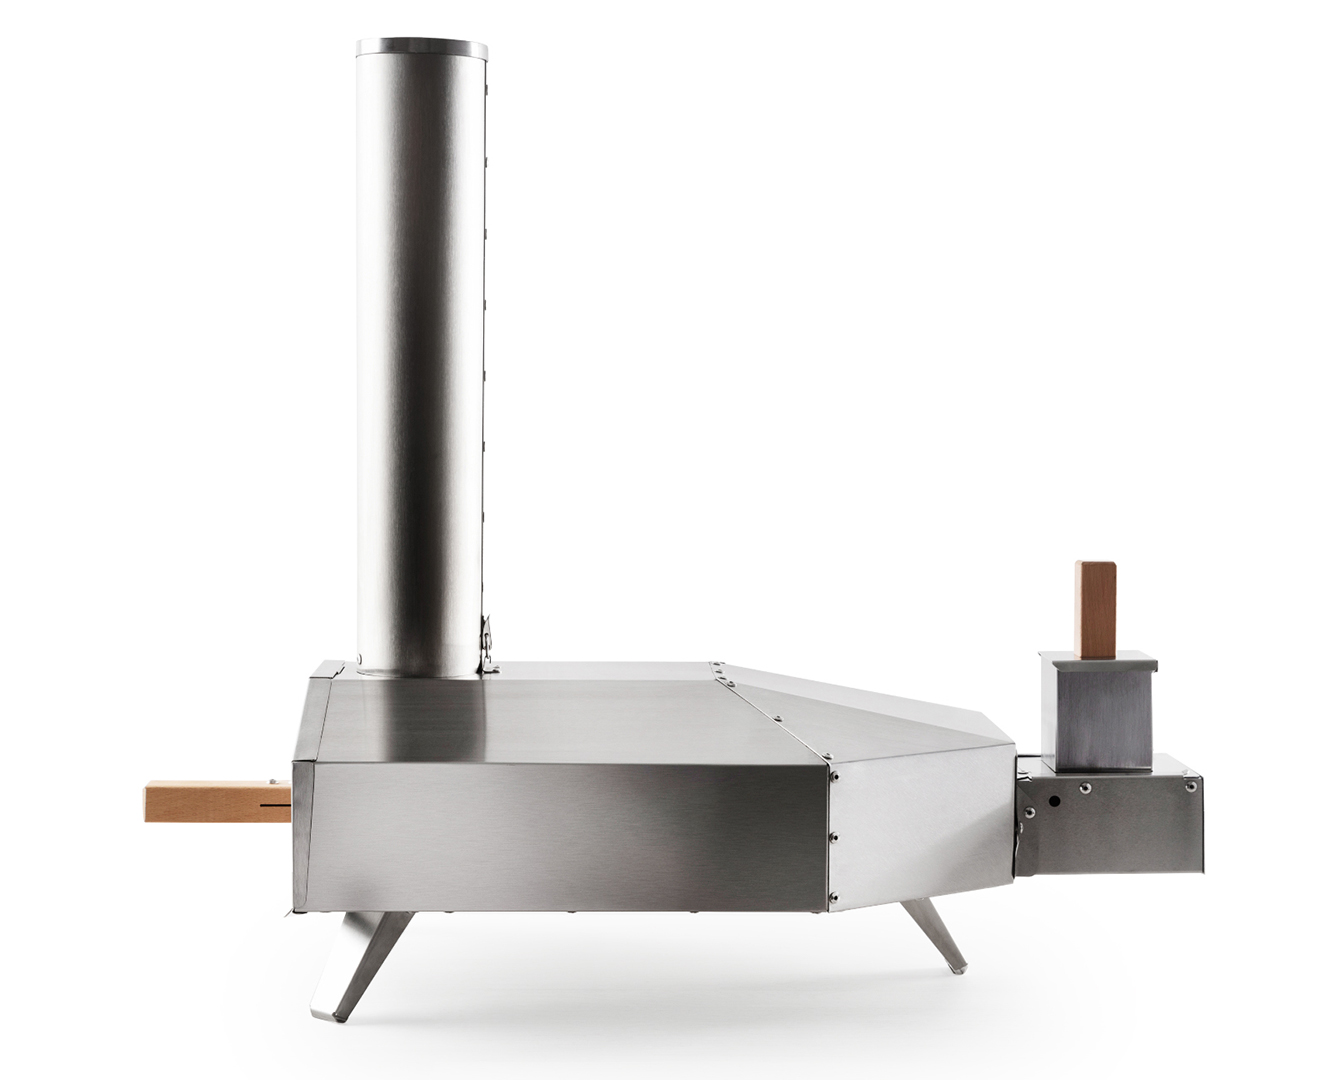 Uuni 3 Portable Wood Fired Pizza Oven Groceryrun Com Au